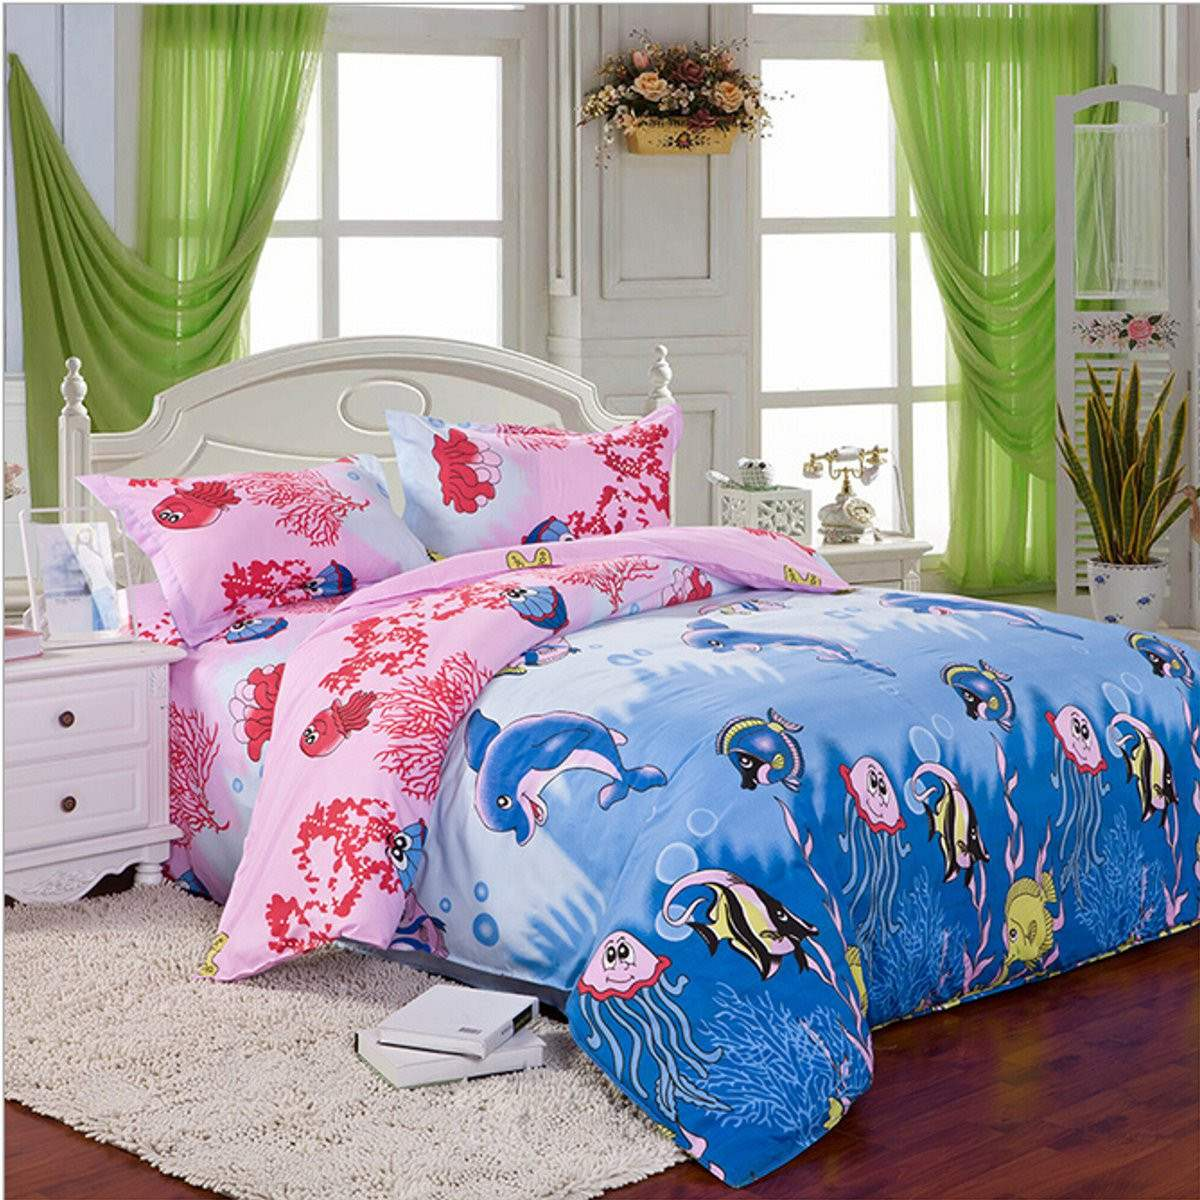 popular all modern pillowsbuy cheap all modern pillows lots from  - duvet cover bedding sets family designer pillow case quilt cover sheetssingle double king all size